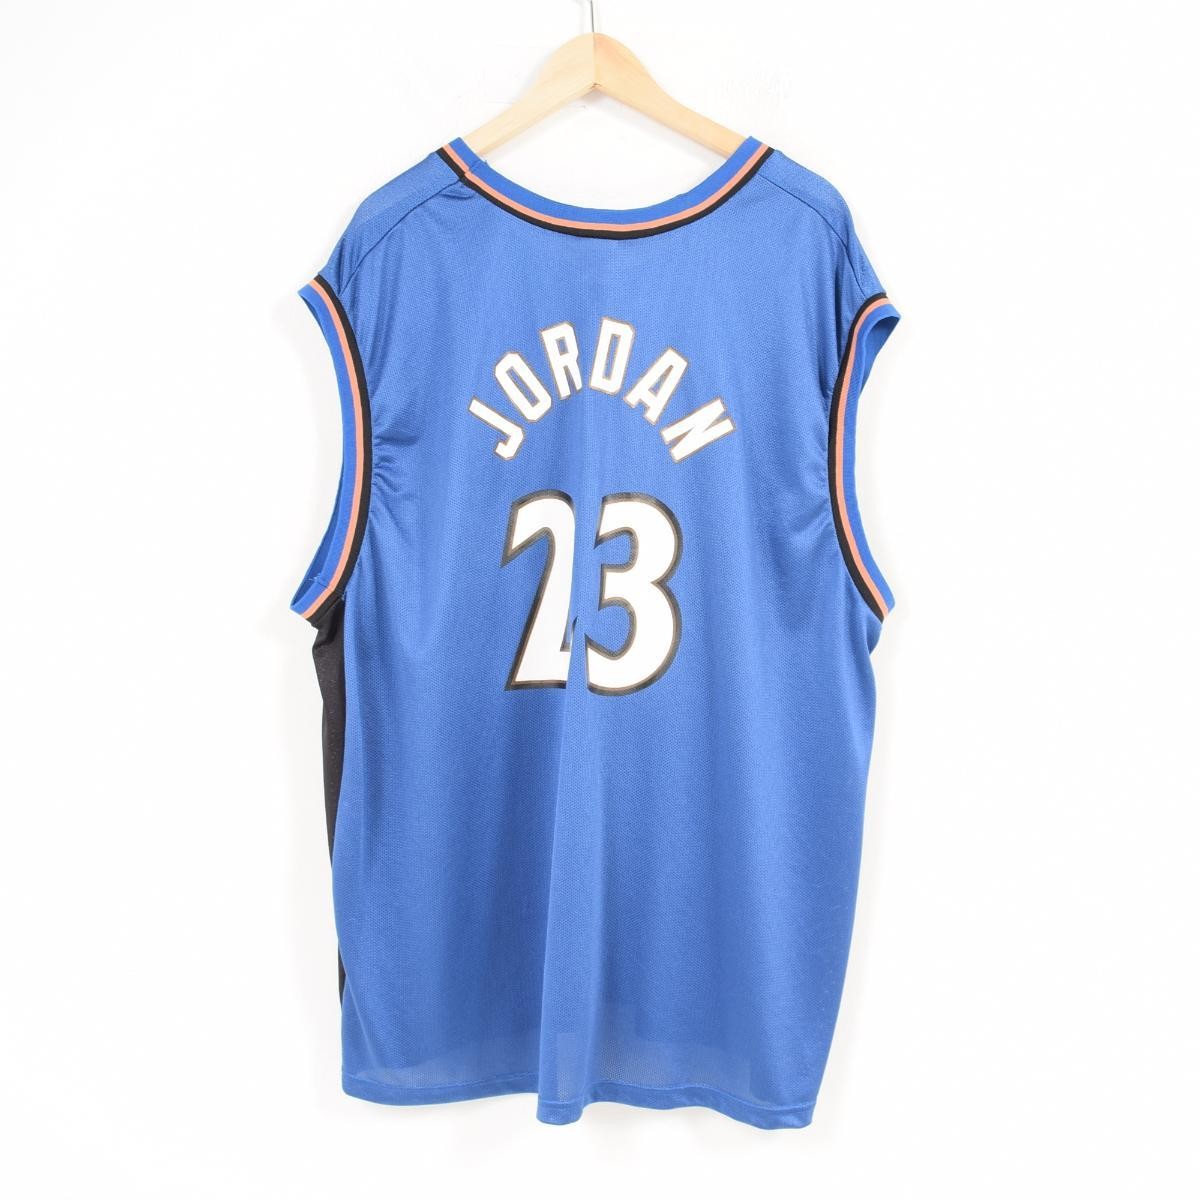 san francisco 6e4c1 31b9f Champion Champion NBA WASHINGTON WIZARDS Washington Wizards MICHAEL JORDAN  Michael Jordan game shirt replica uniform men XXL /wau6779